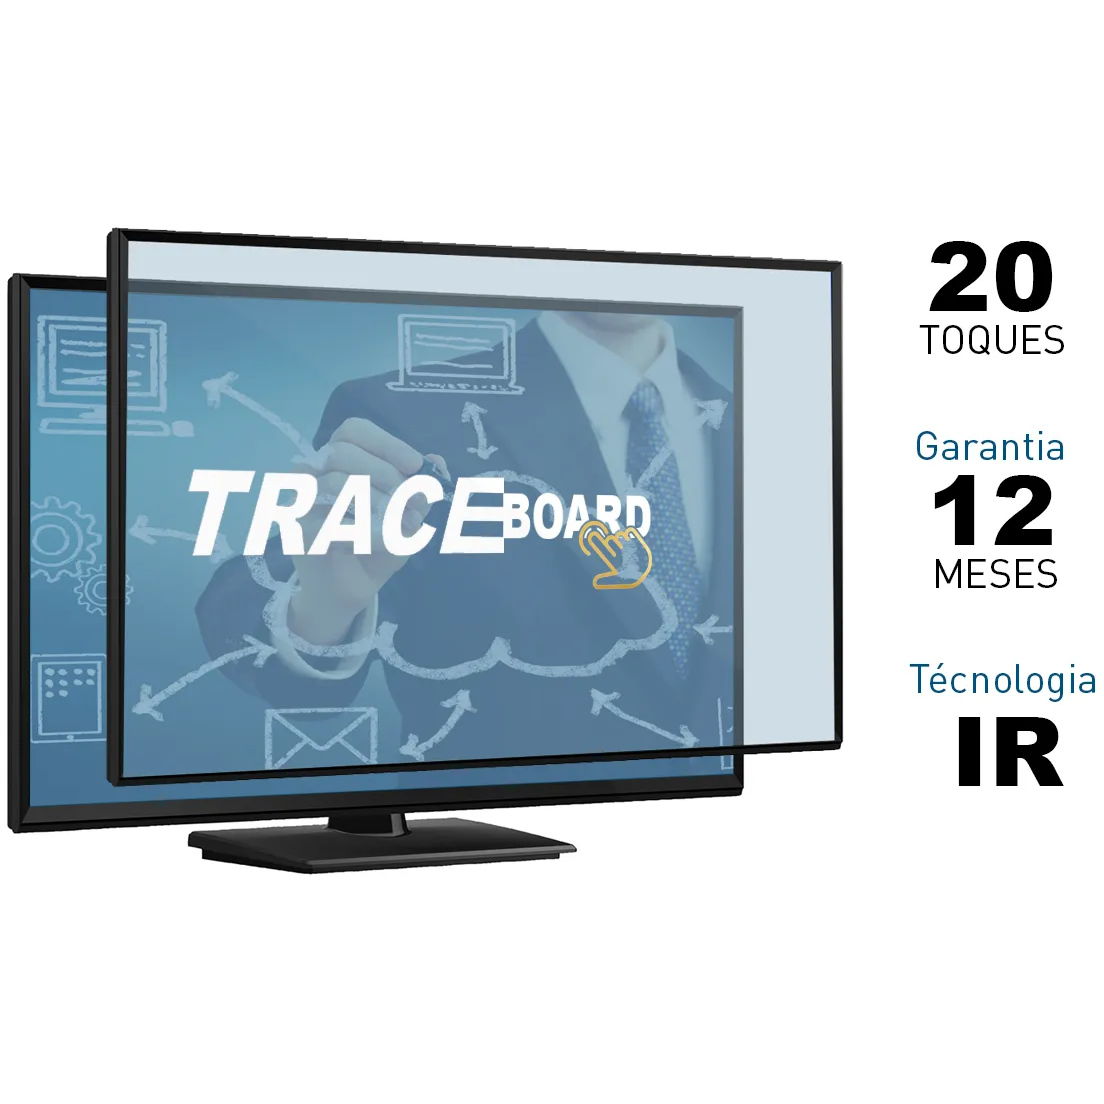 Moldura Touch Screen TRACEBOARD Frame Interativa 20 Toques 50